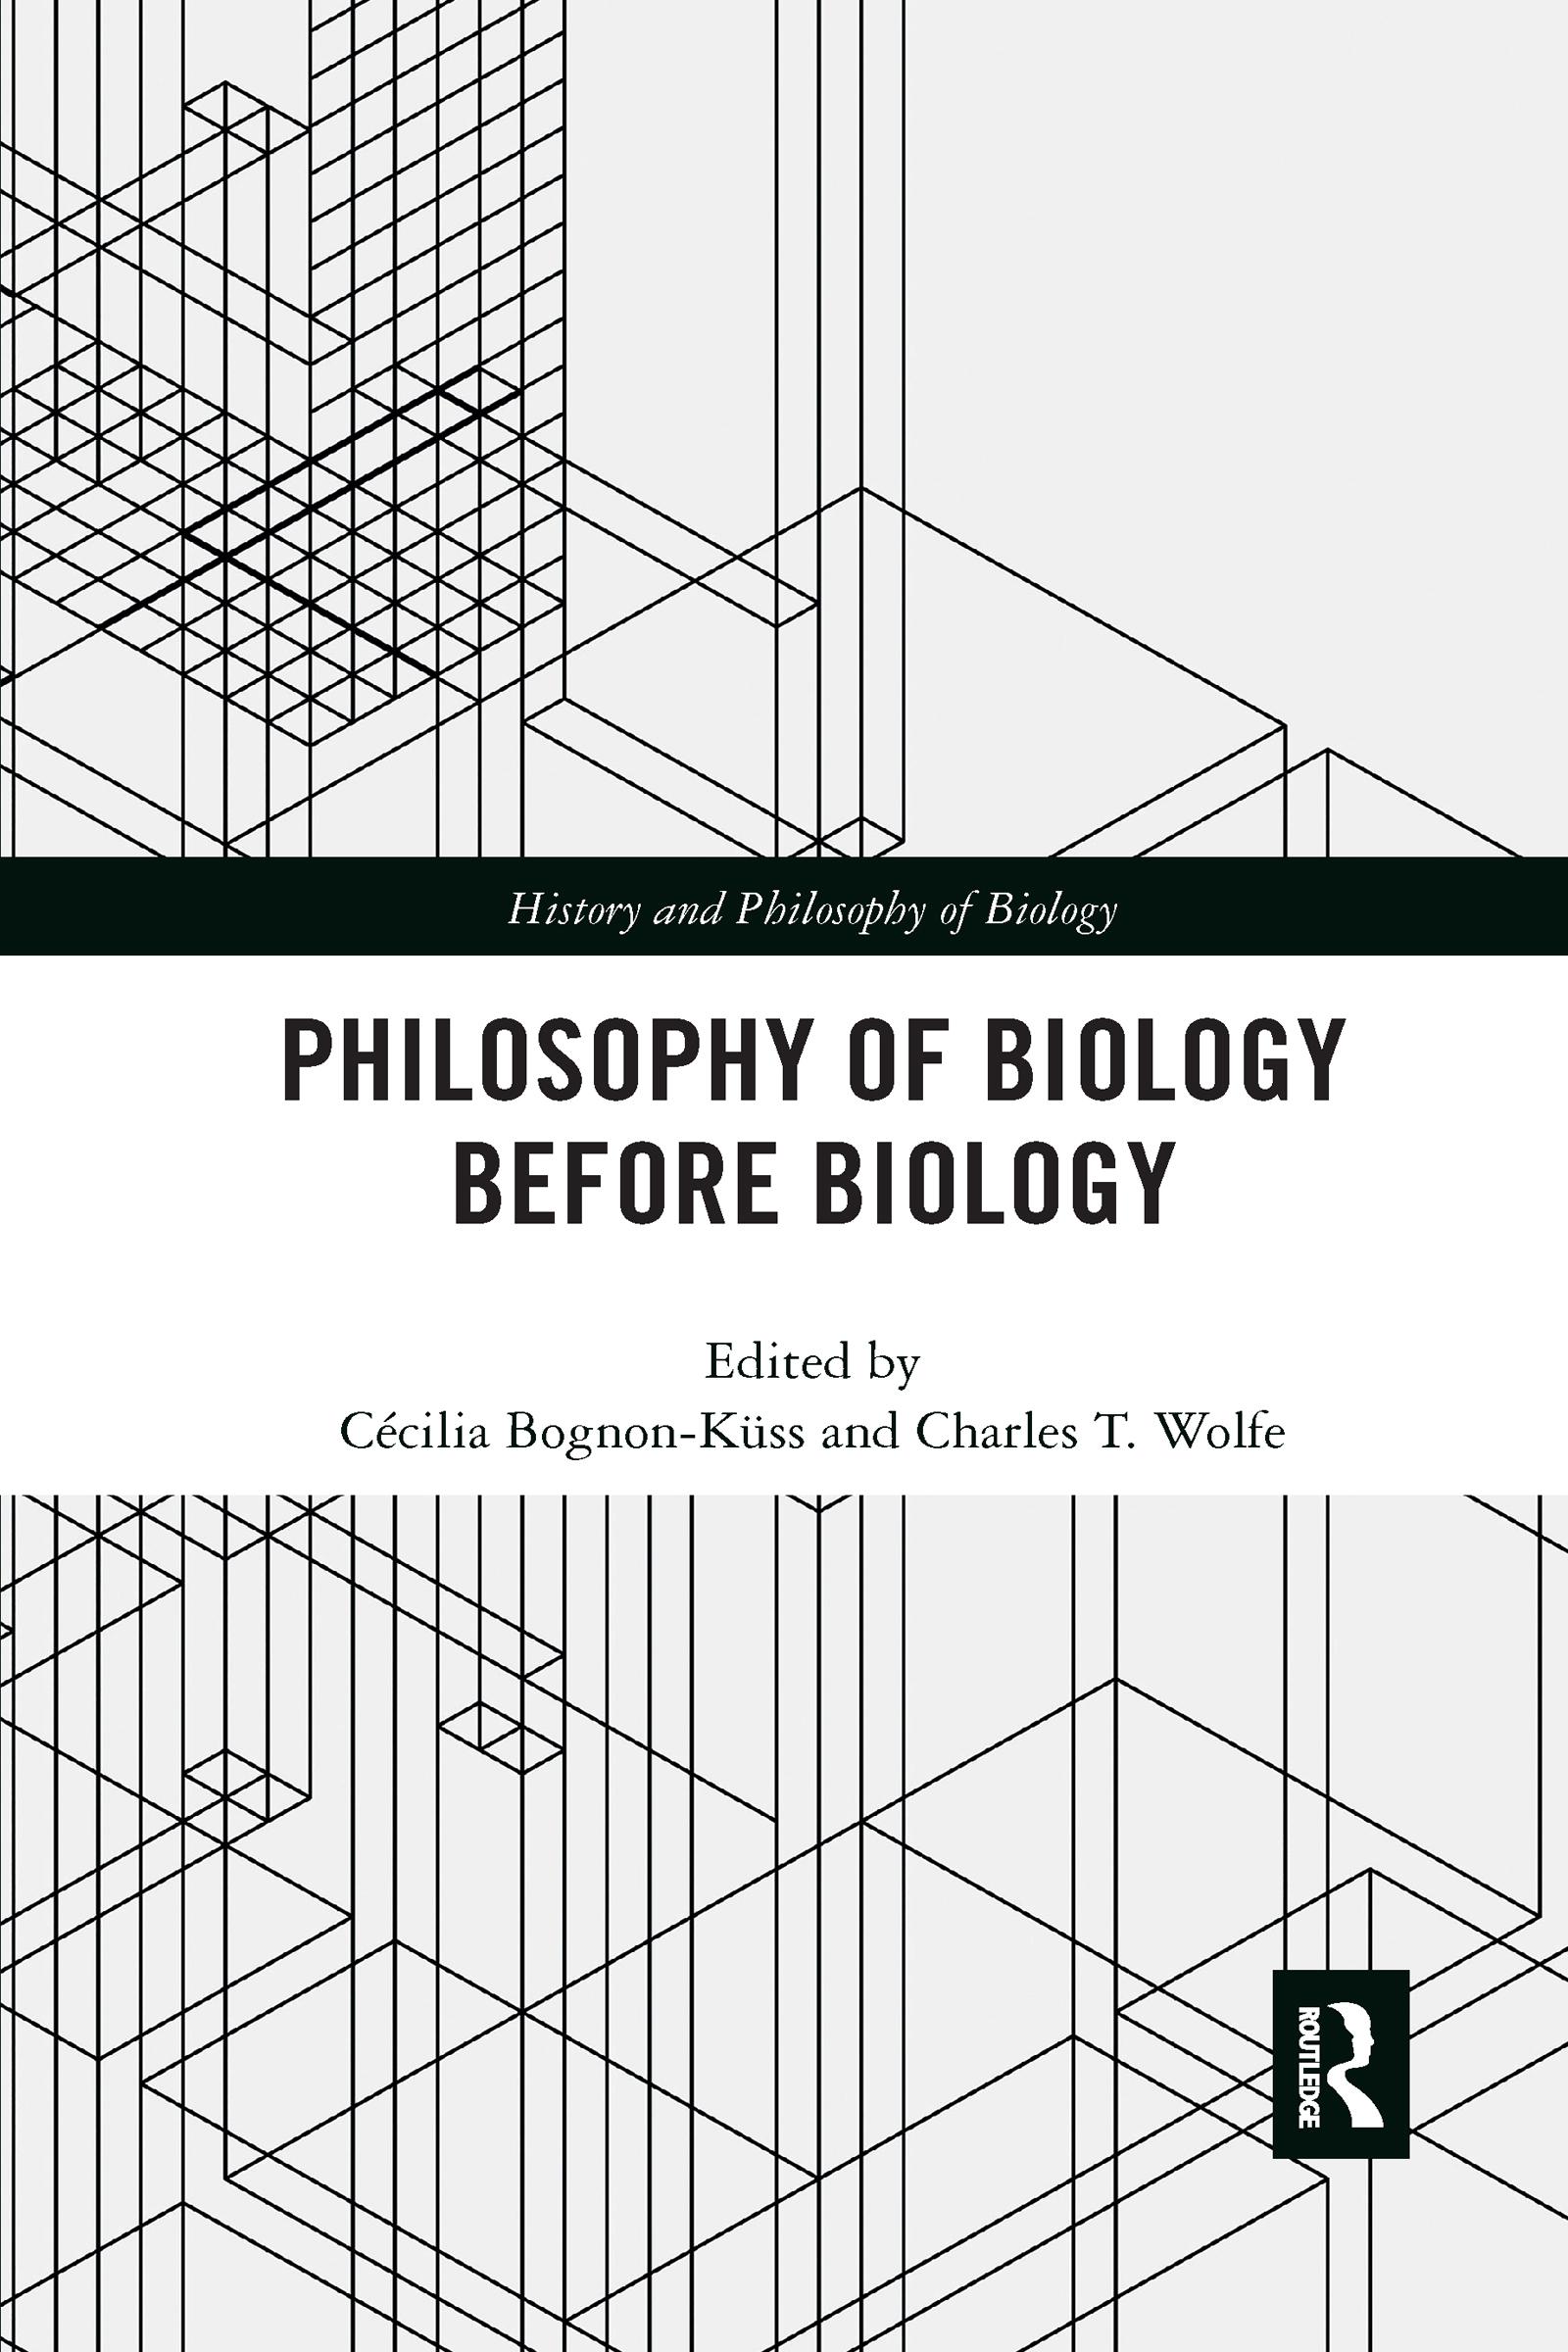 Philosophy of Biology Before Biology